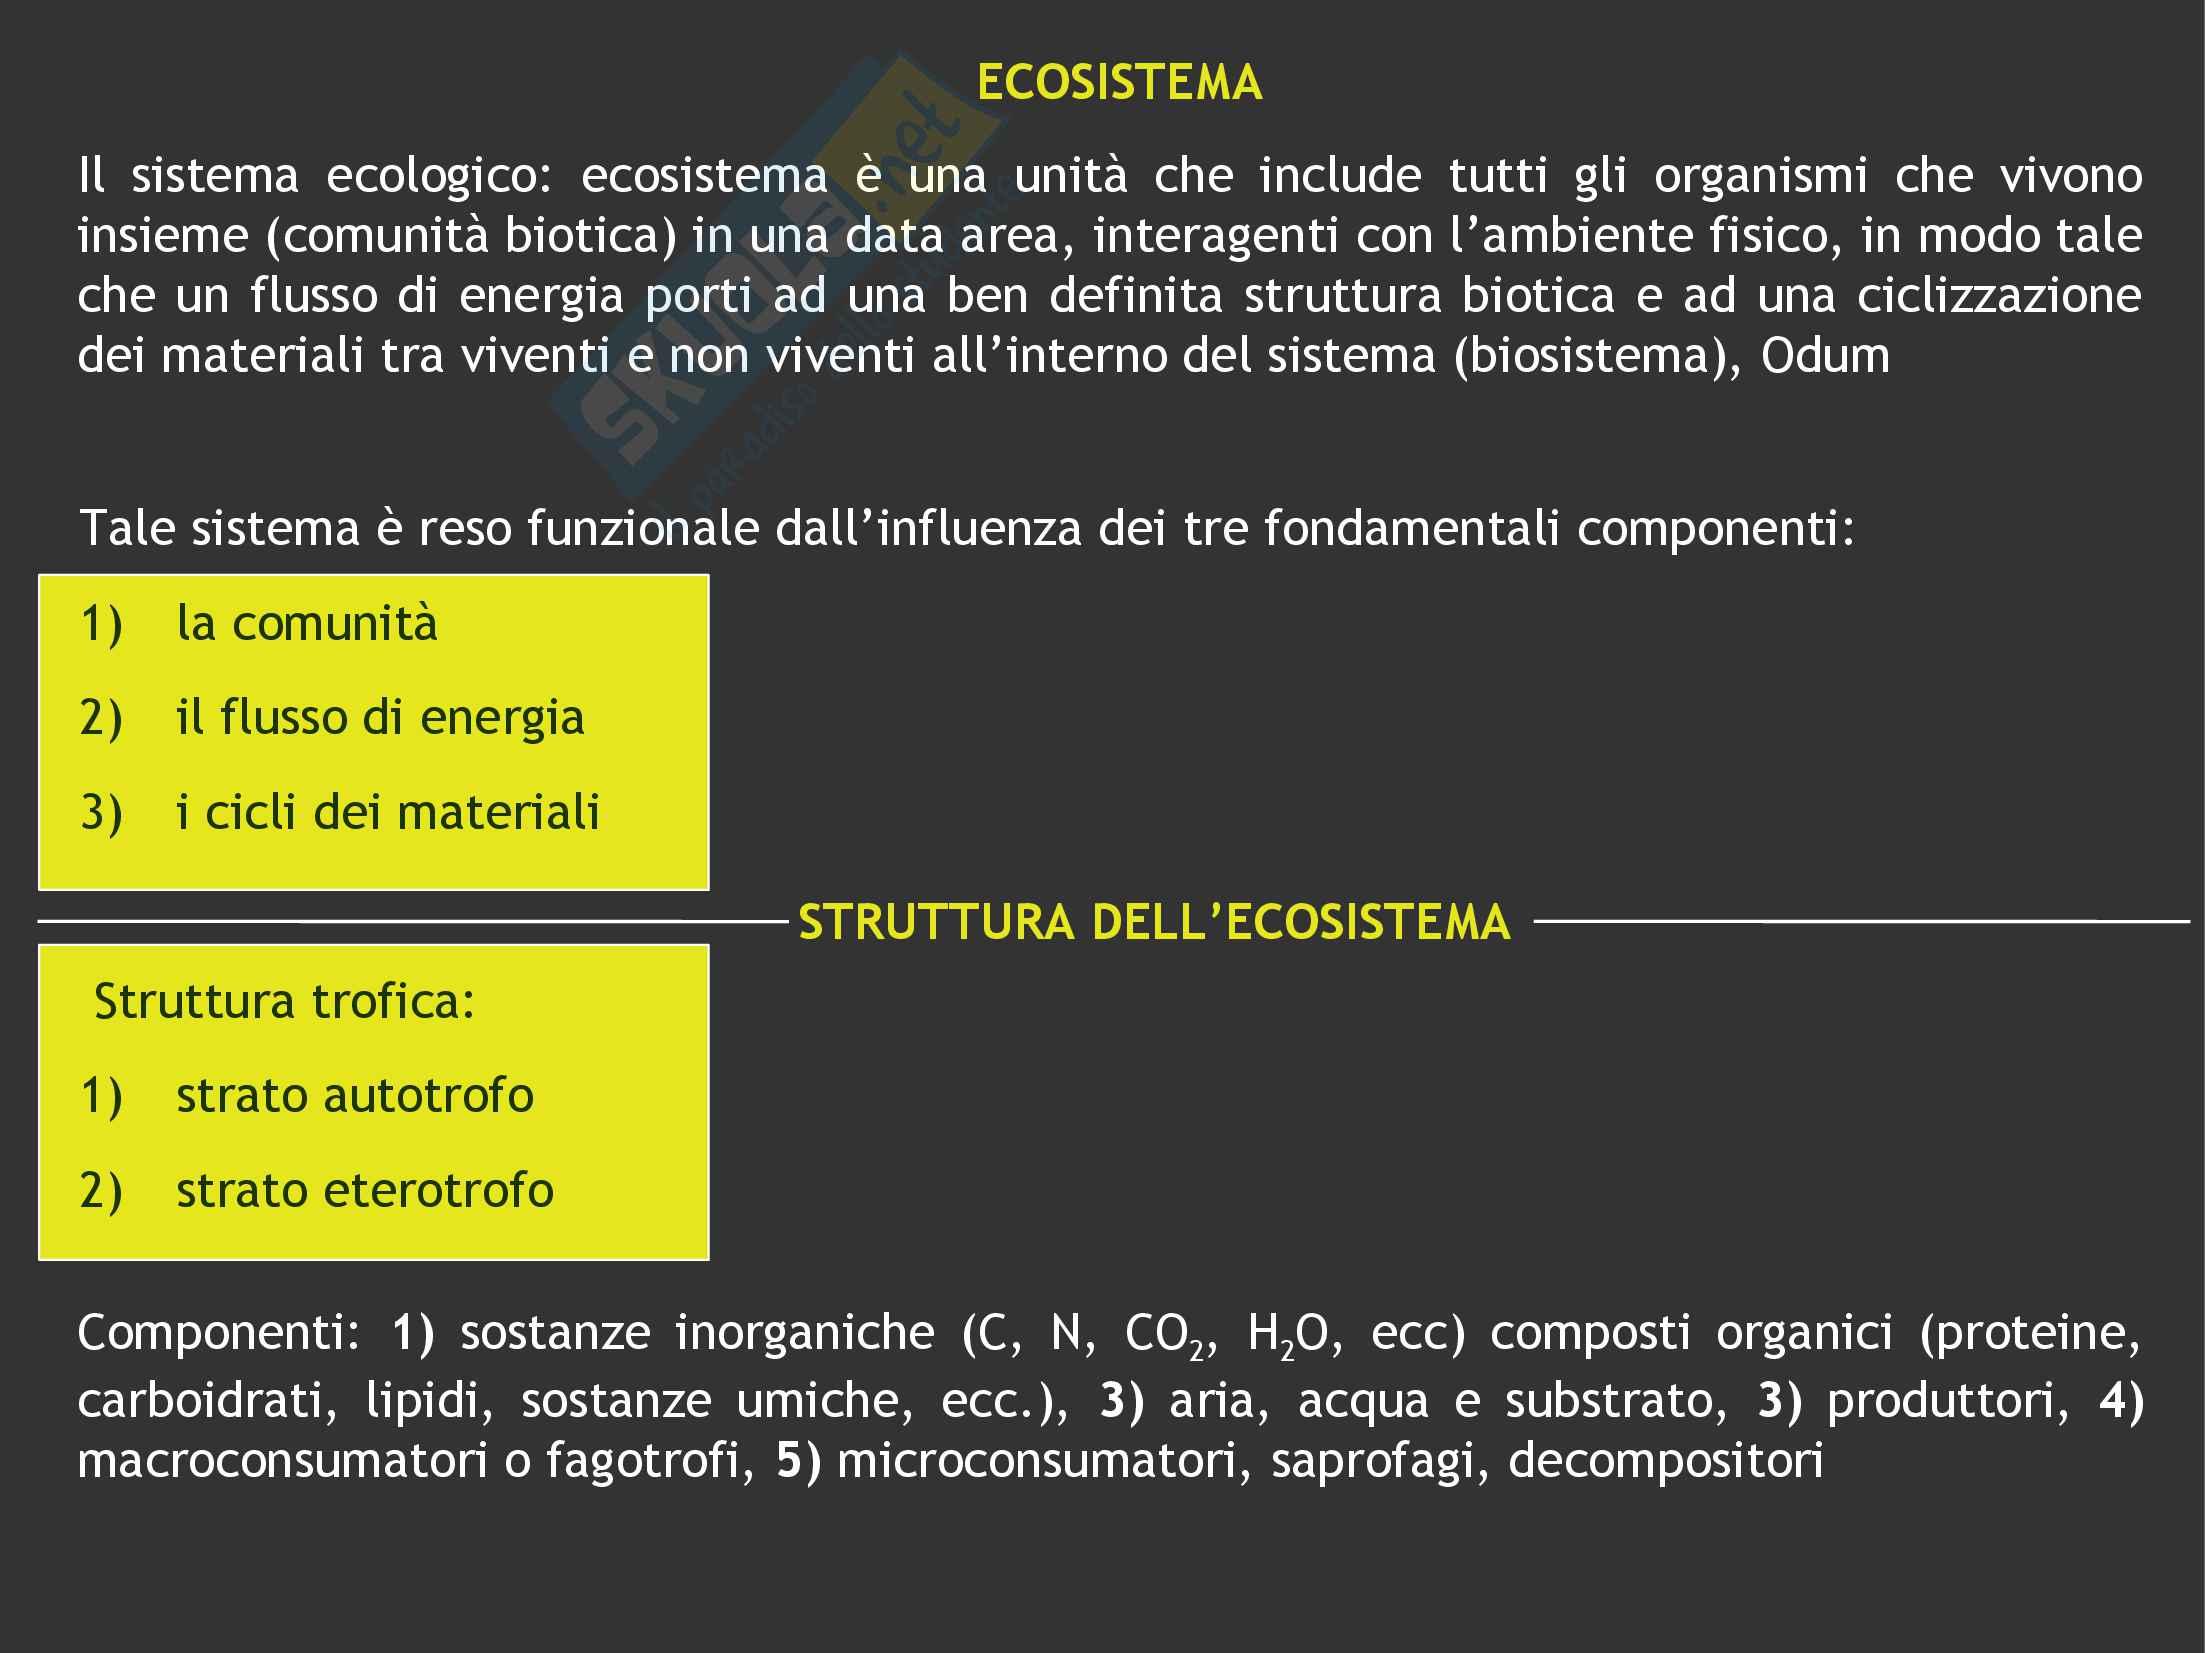 Ecologia: Ecosistema